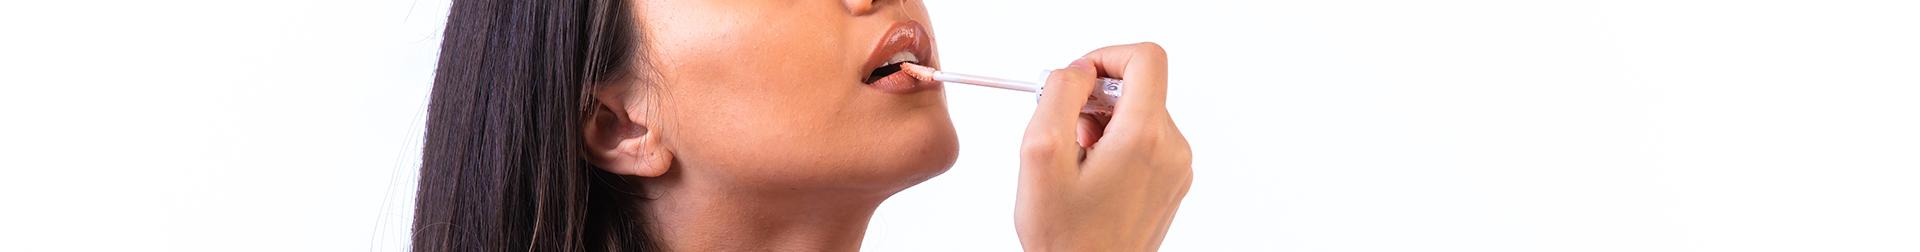 Makeup Lip Products | Lip Plumpers - Buy Lip Plumper Online | AromaCraze